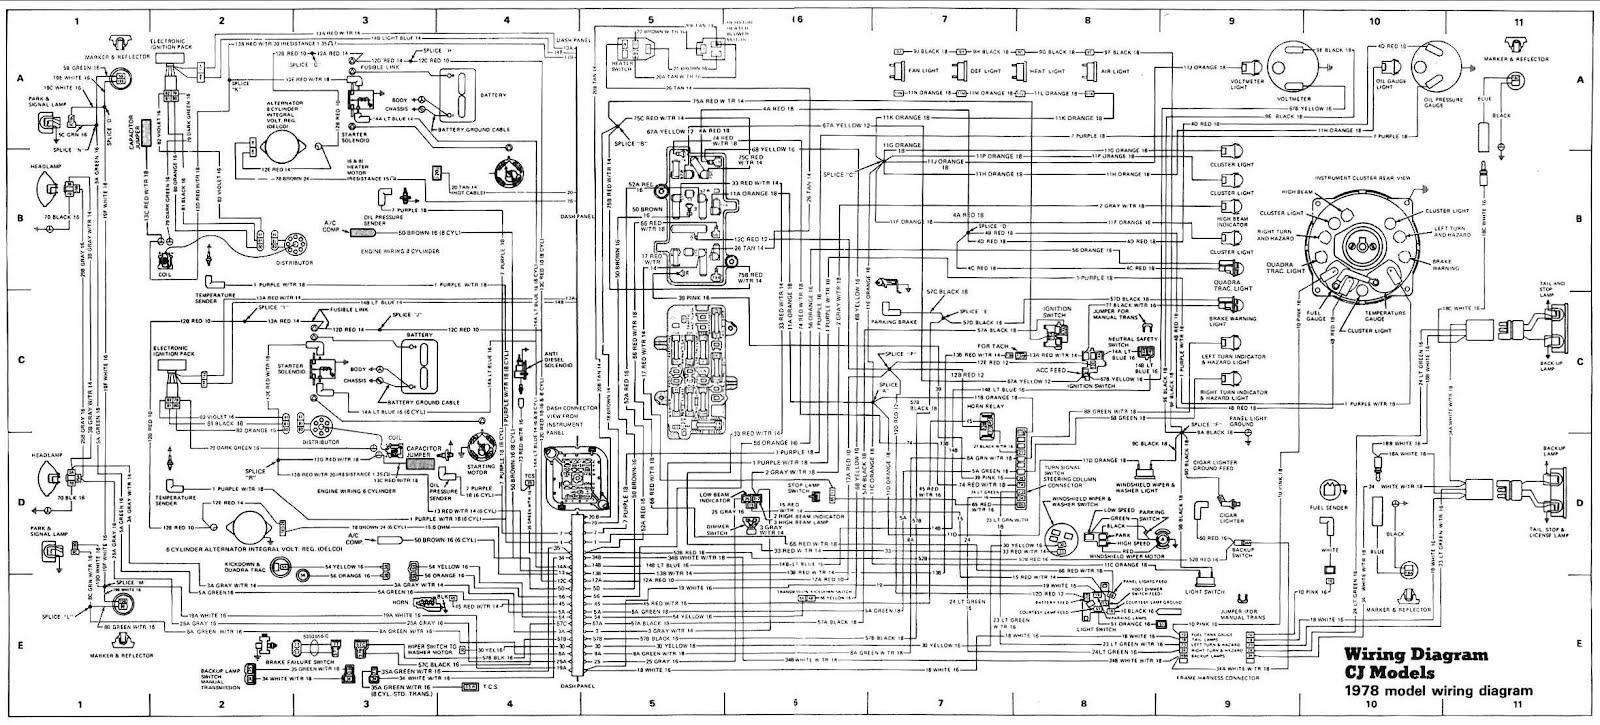 jeep cherokee wiring diagrams - efcaviation, Wiring diagram